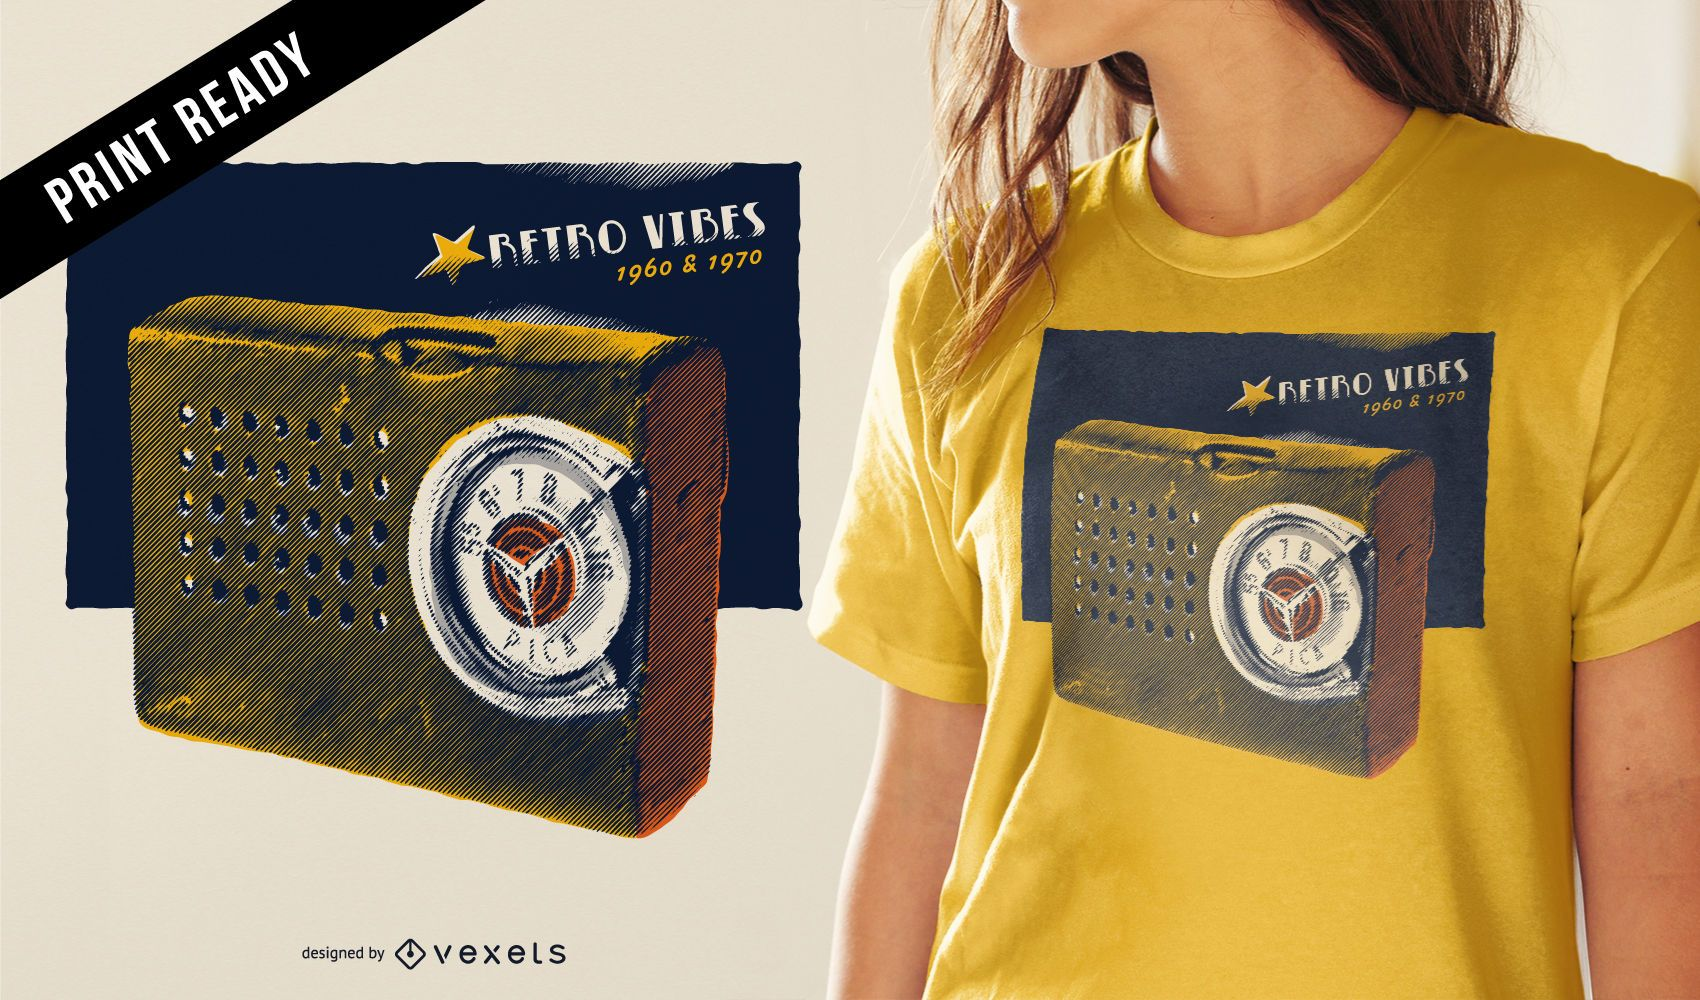 Vintage radio t-shirt design